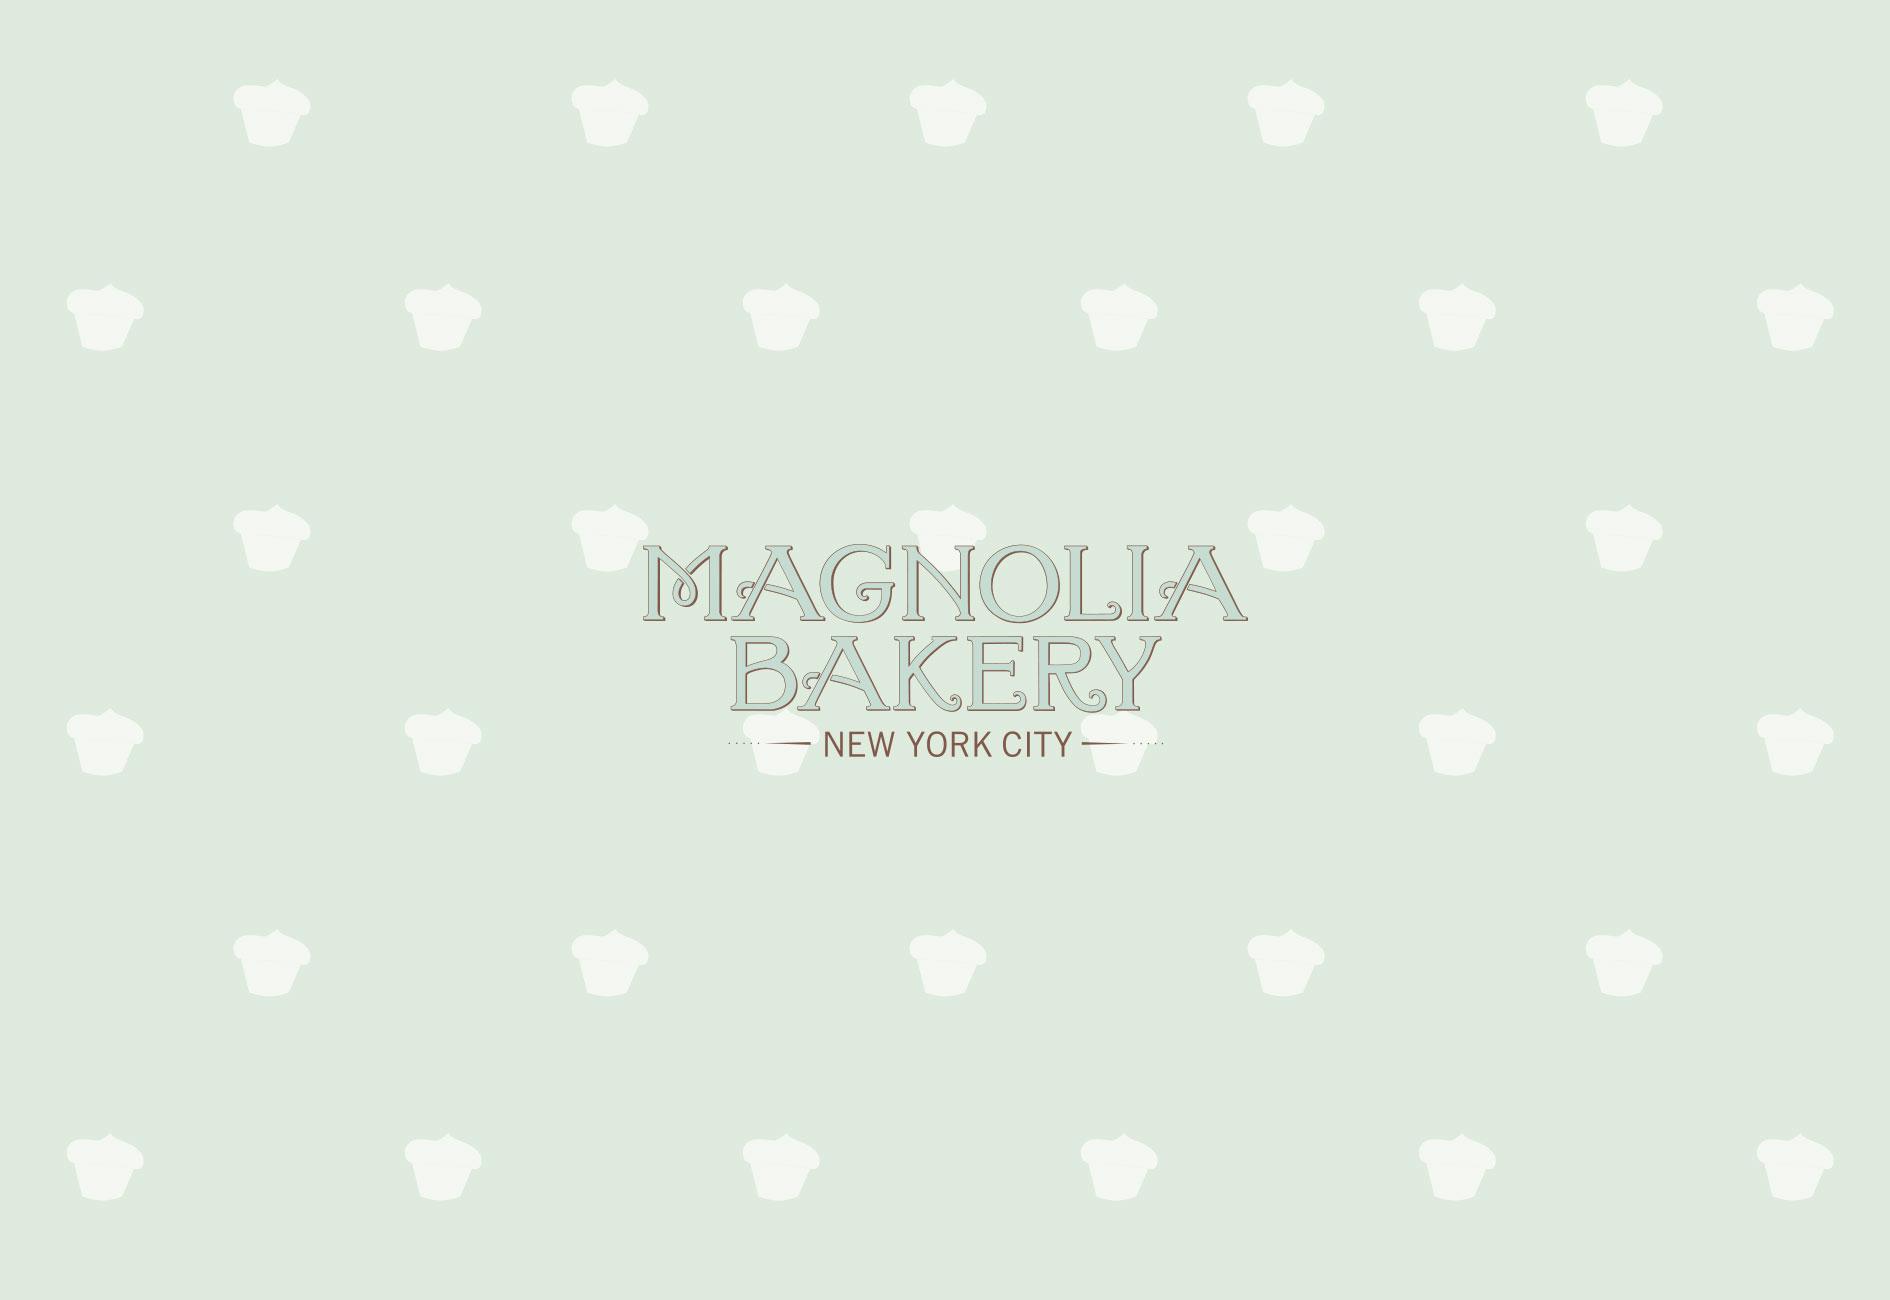 Magnolia-Bakery-Brand-01.jpg